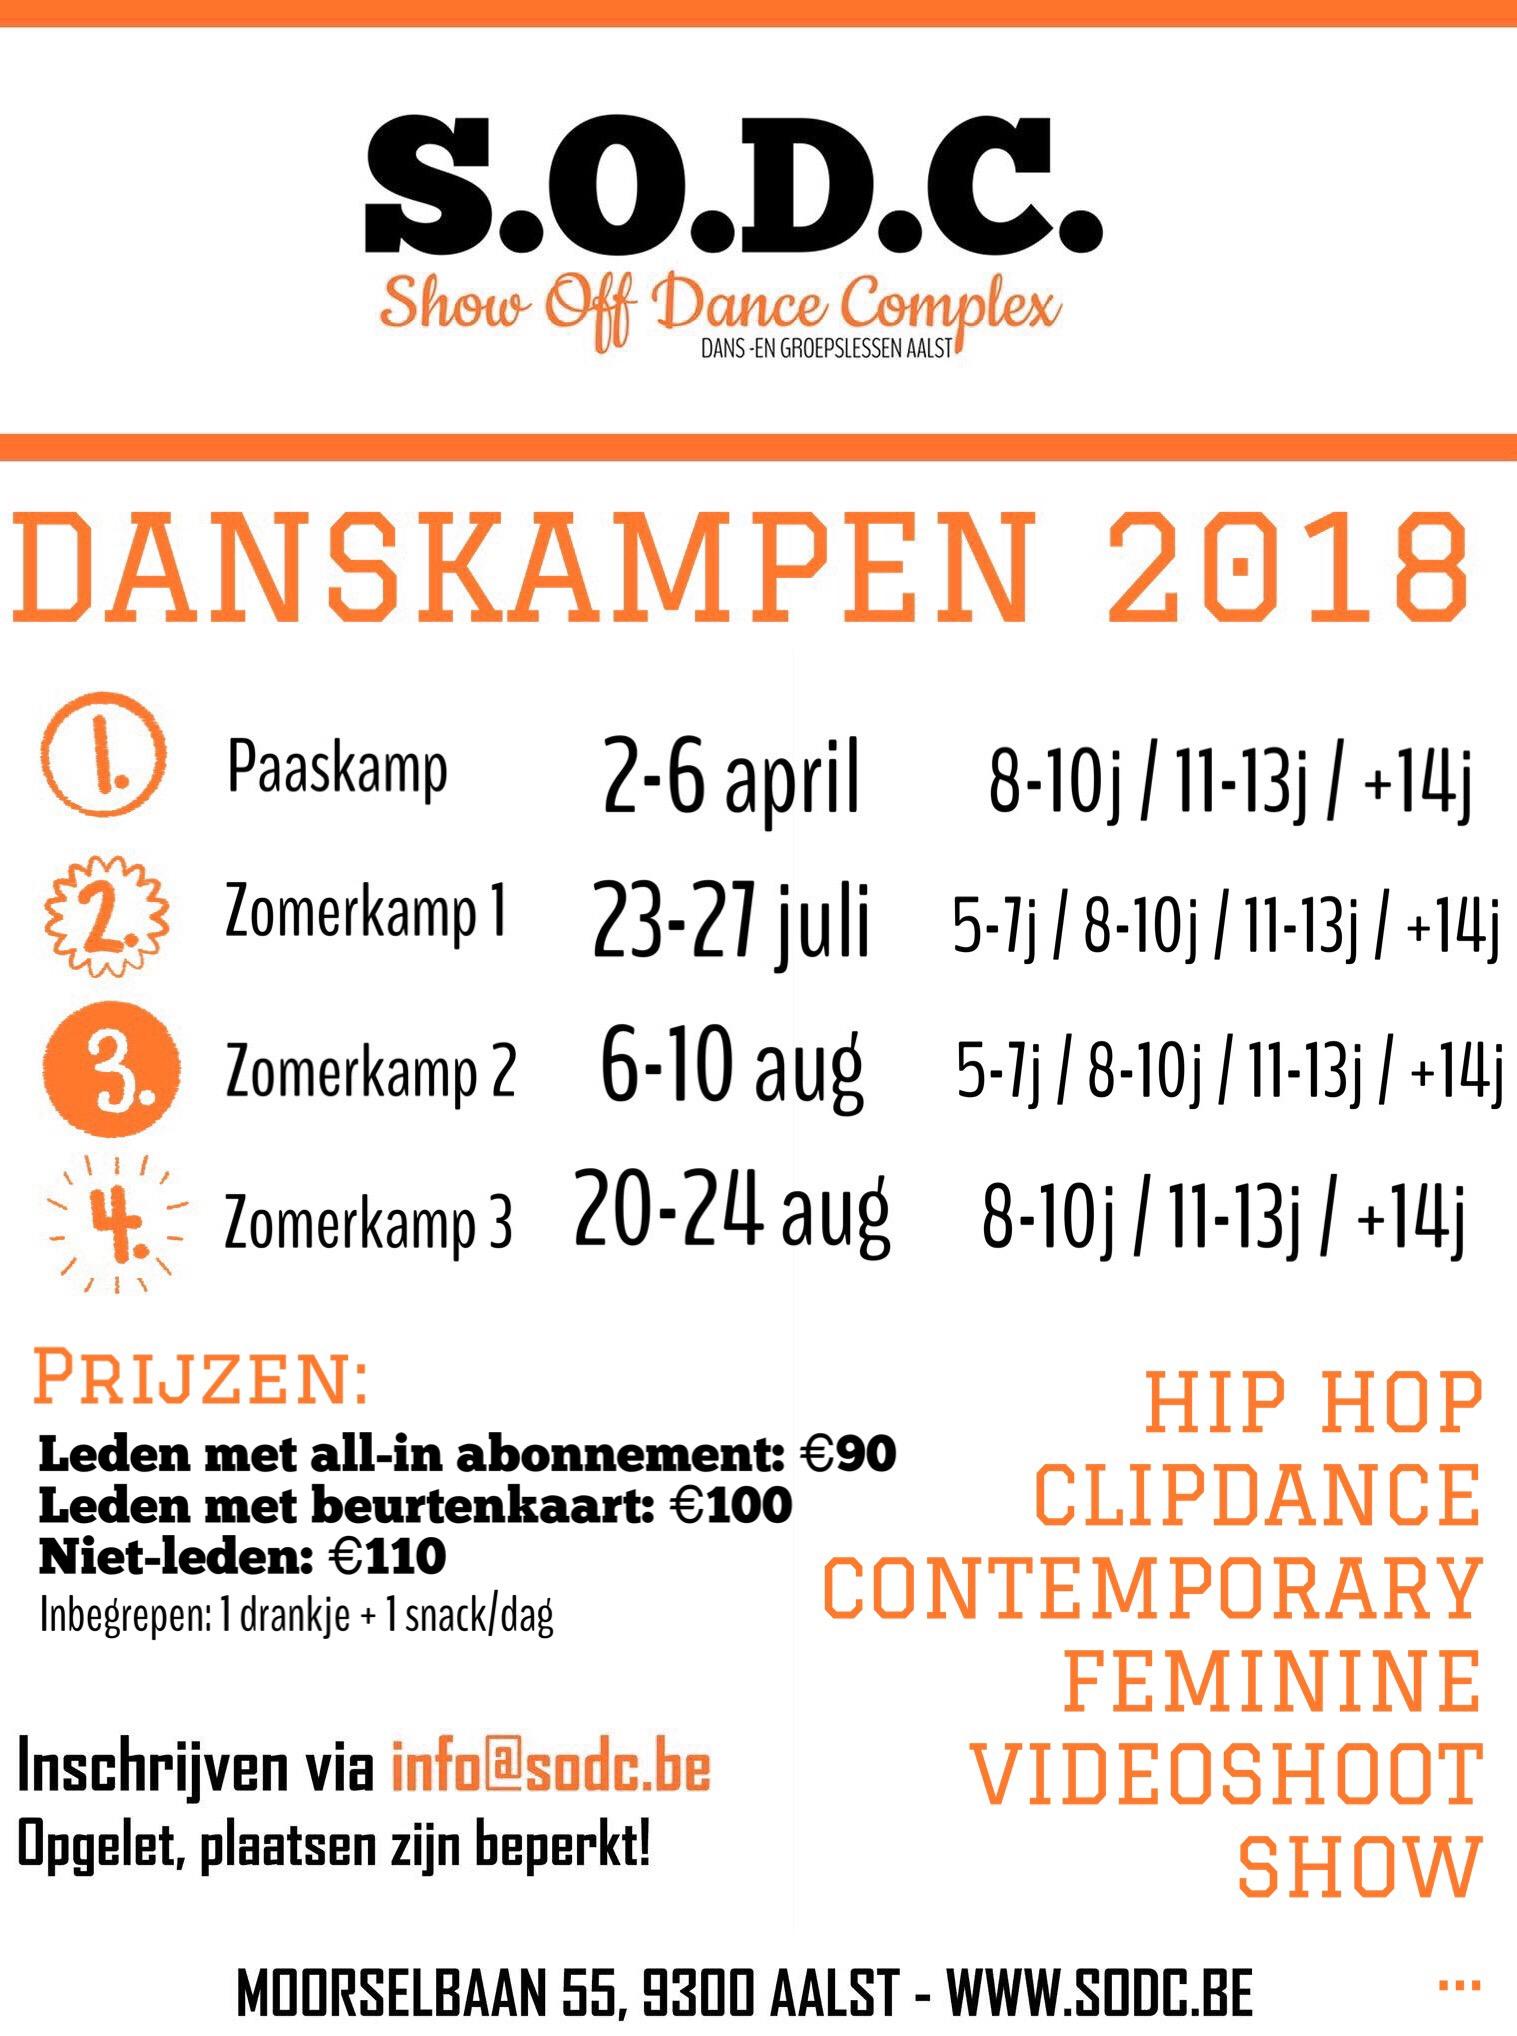 DANSKAMPEN 2018